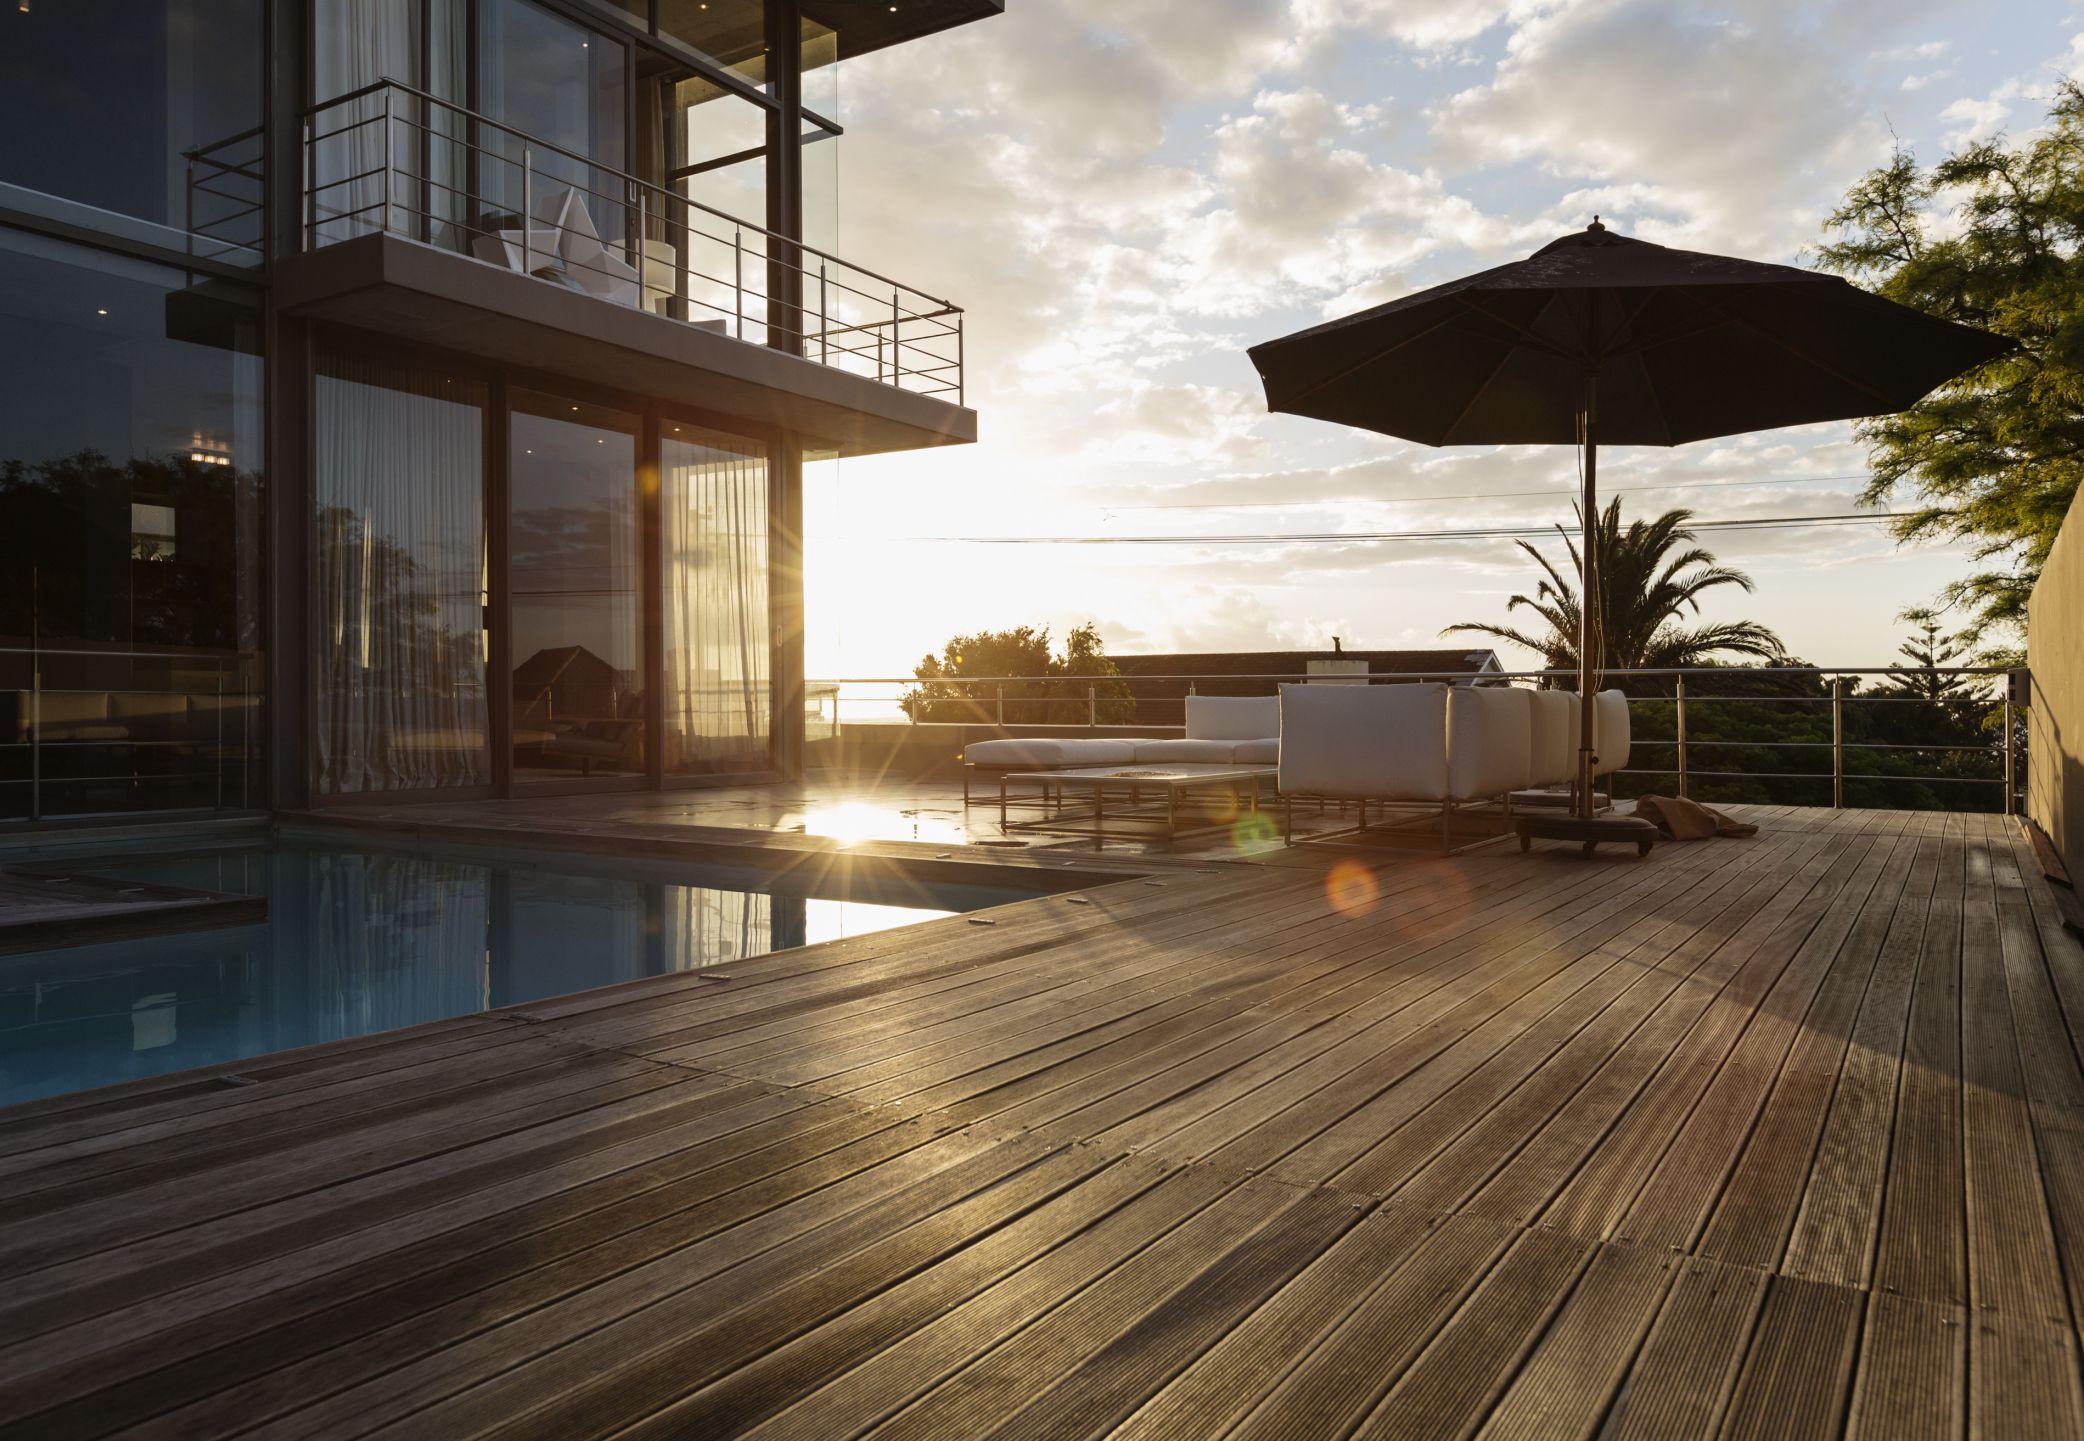 hardwood floor repair oklahoma city of deck code deck guardrail height guards and balusters inside house with deck 483599469 56a4a12d5f9b58b7d0d7e5c0